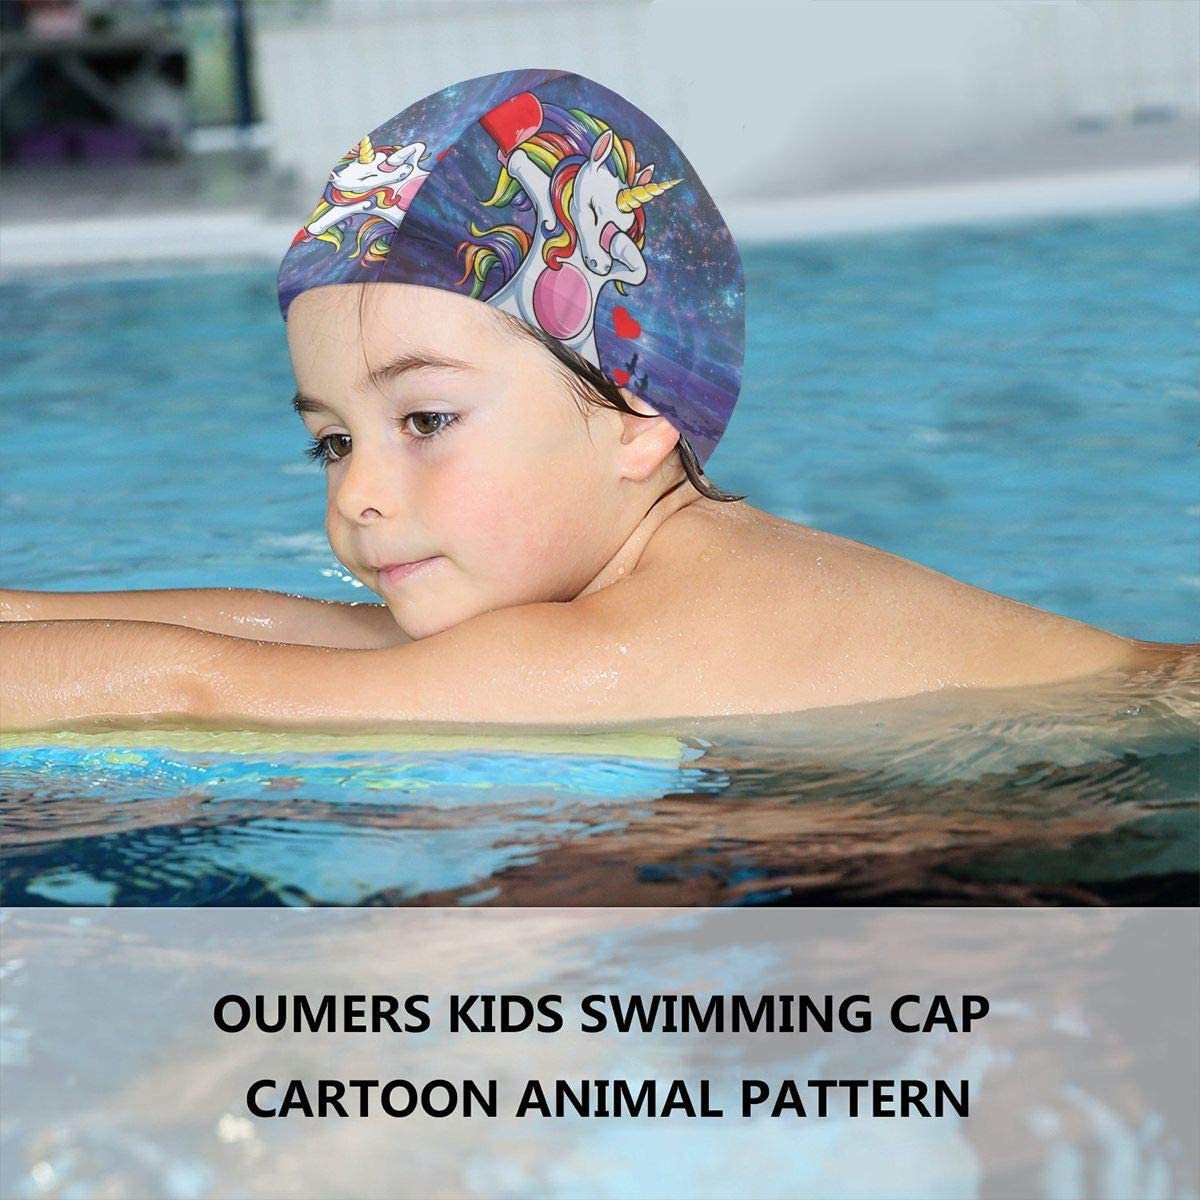 Dabbing Unicorn Heart Men Girls Kid Galaxy Cartoon Swimming Pool Bathing Shower Caps Hat Head Cover Waterproof Reusable for Kid Girls Boy Junior Toddler Children Baby Beach Dress Clothing